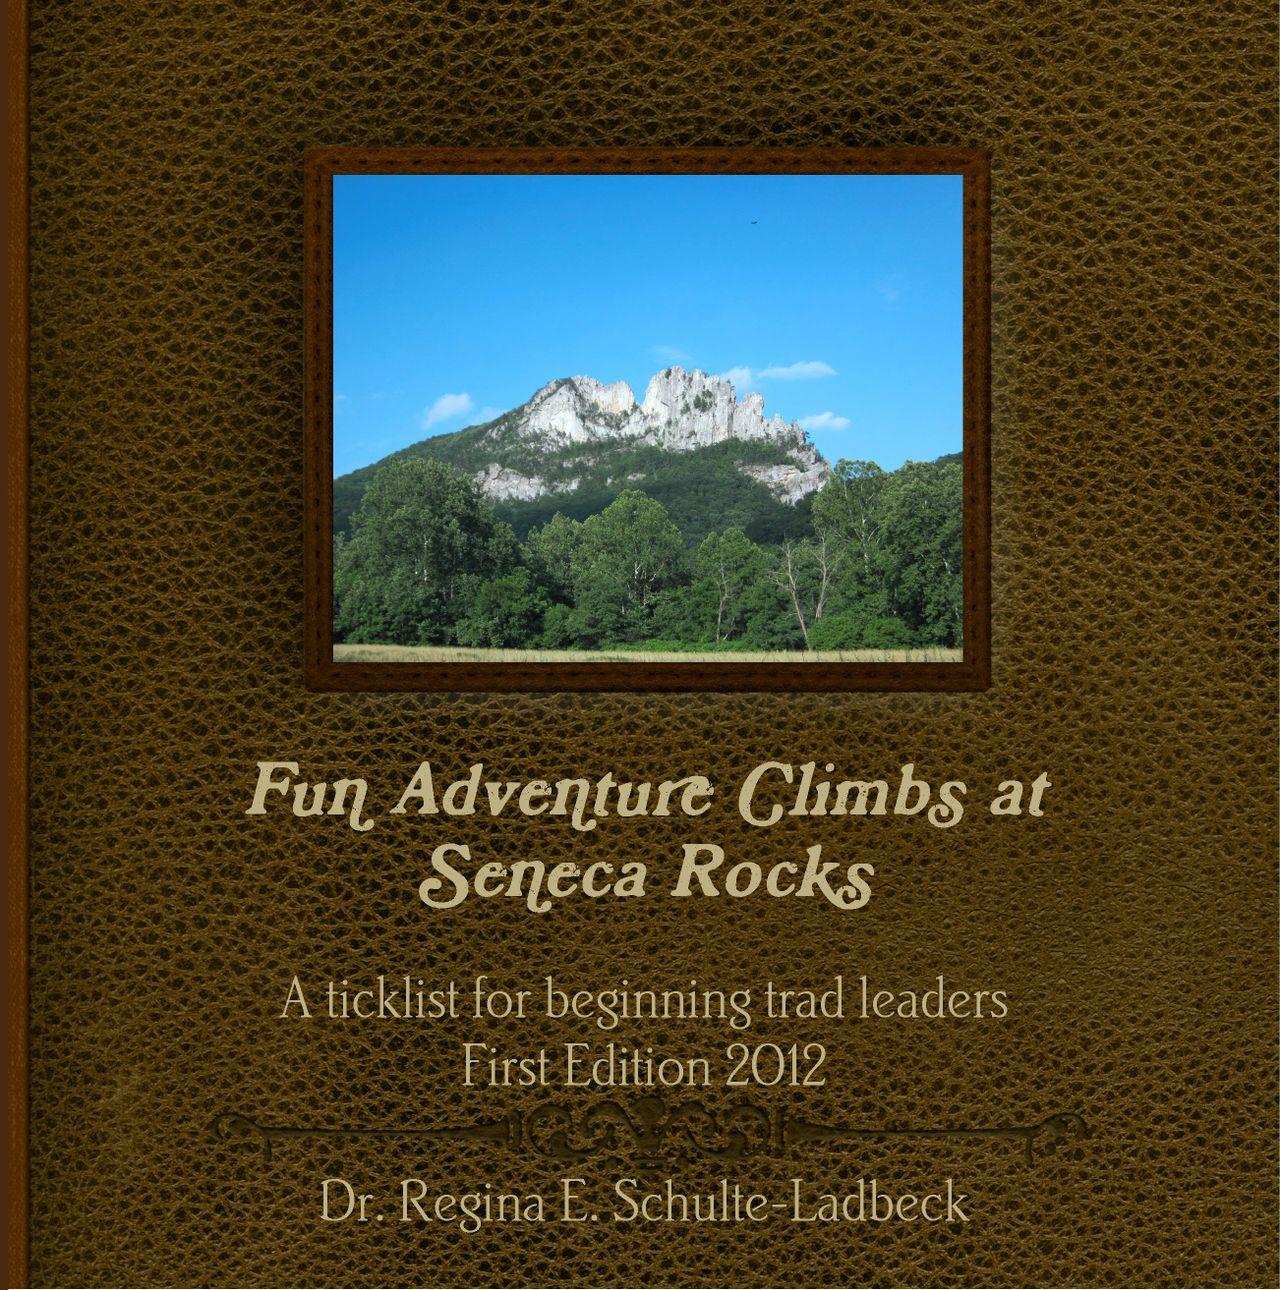 Fun Adventure Climbs at Seneca Rocks - A ticklist for beginning trad leaders